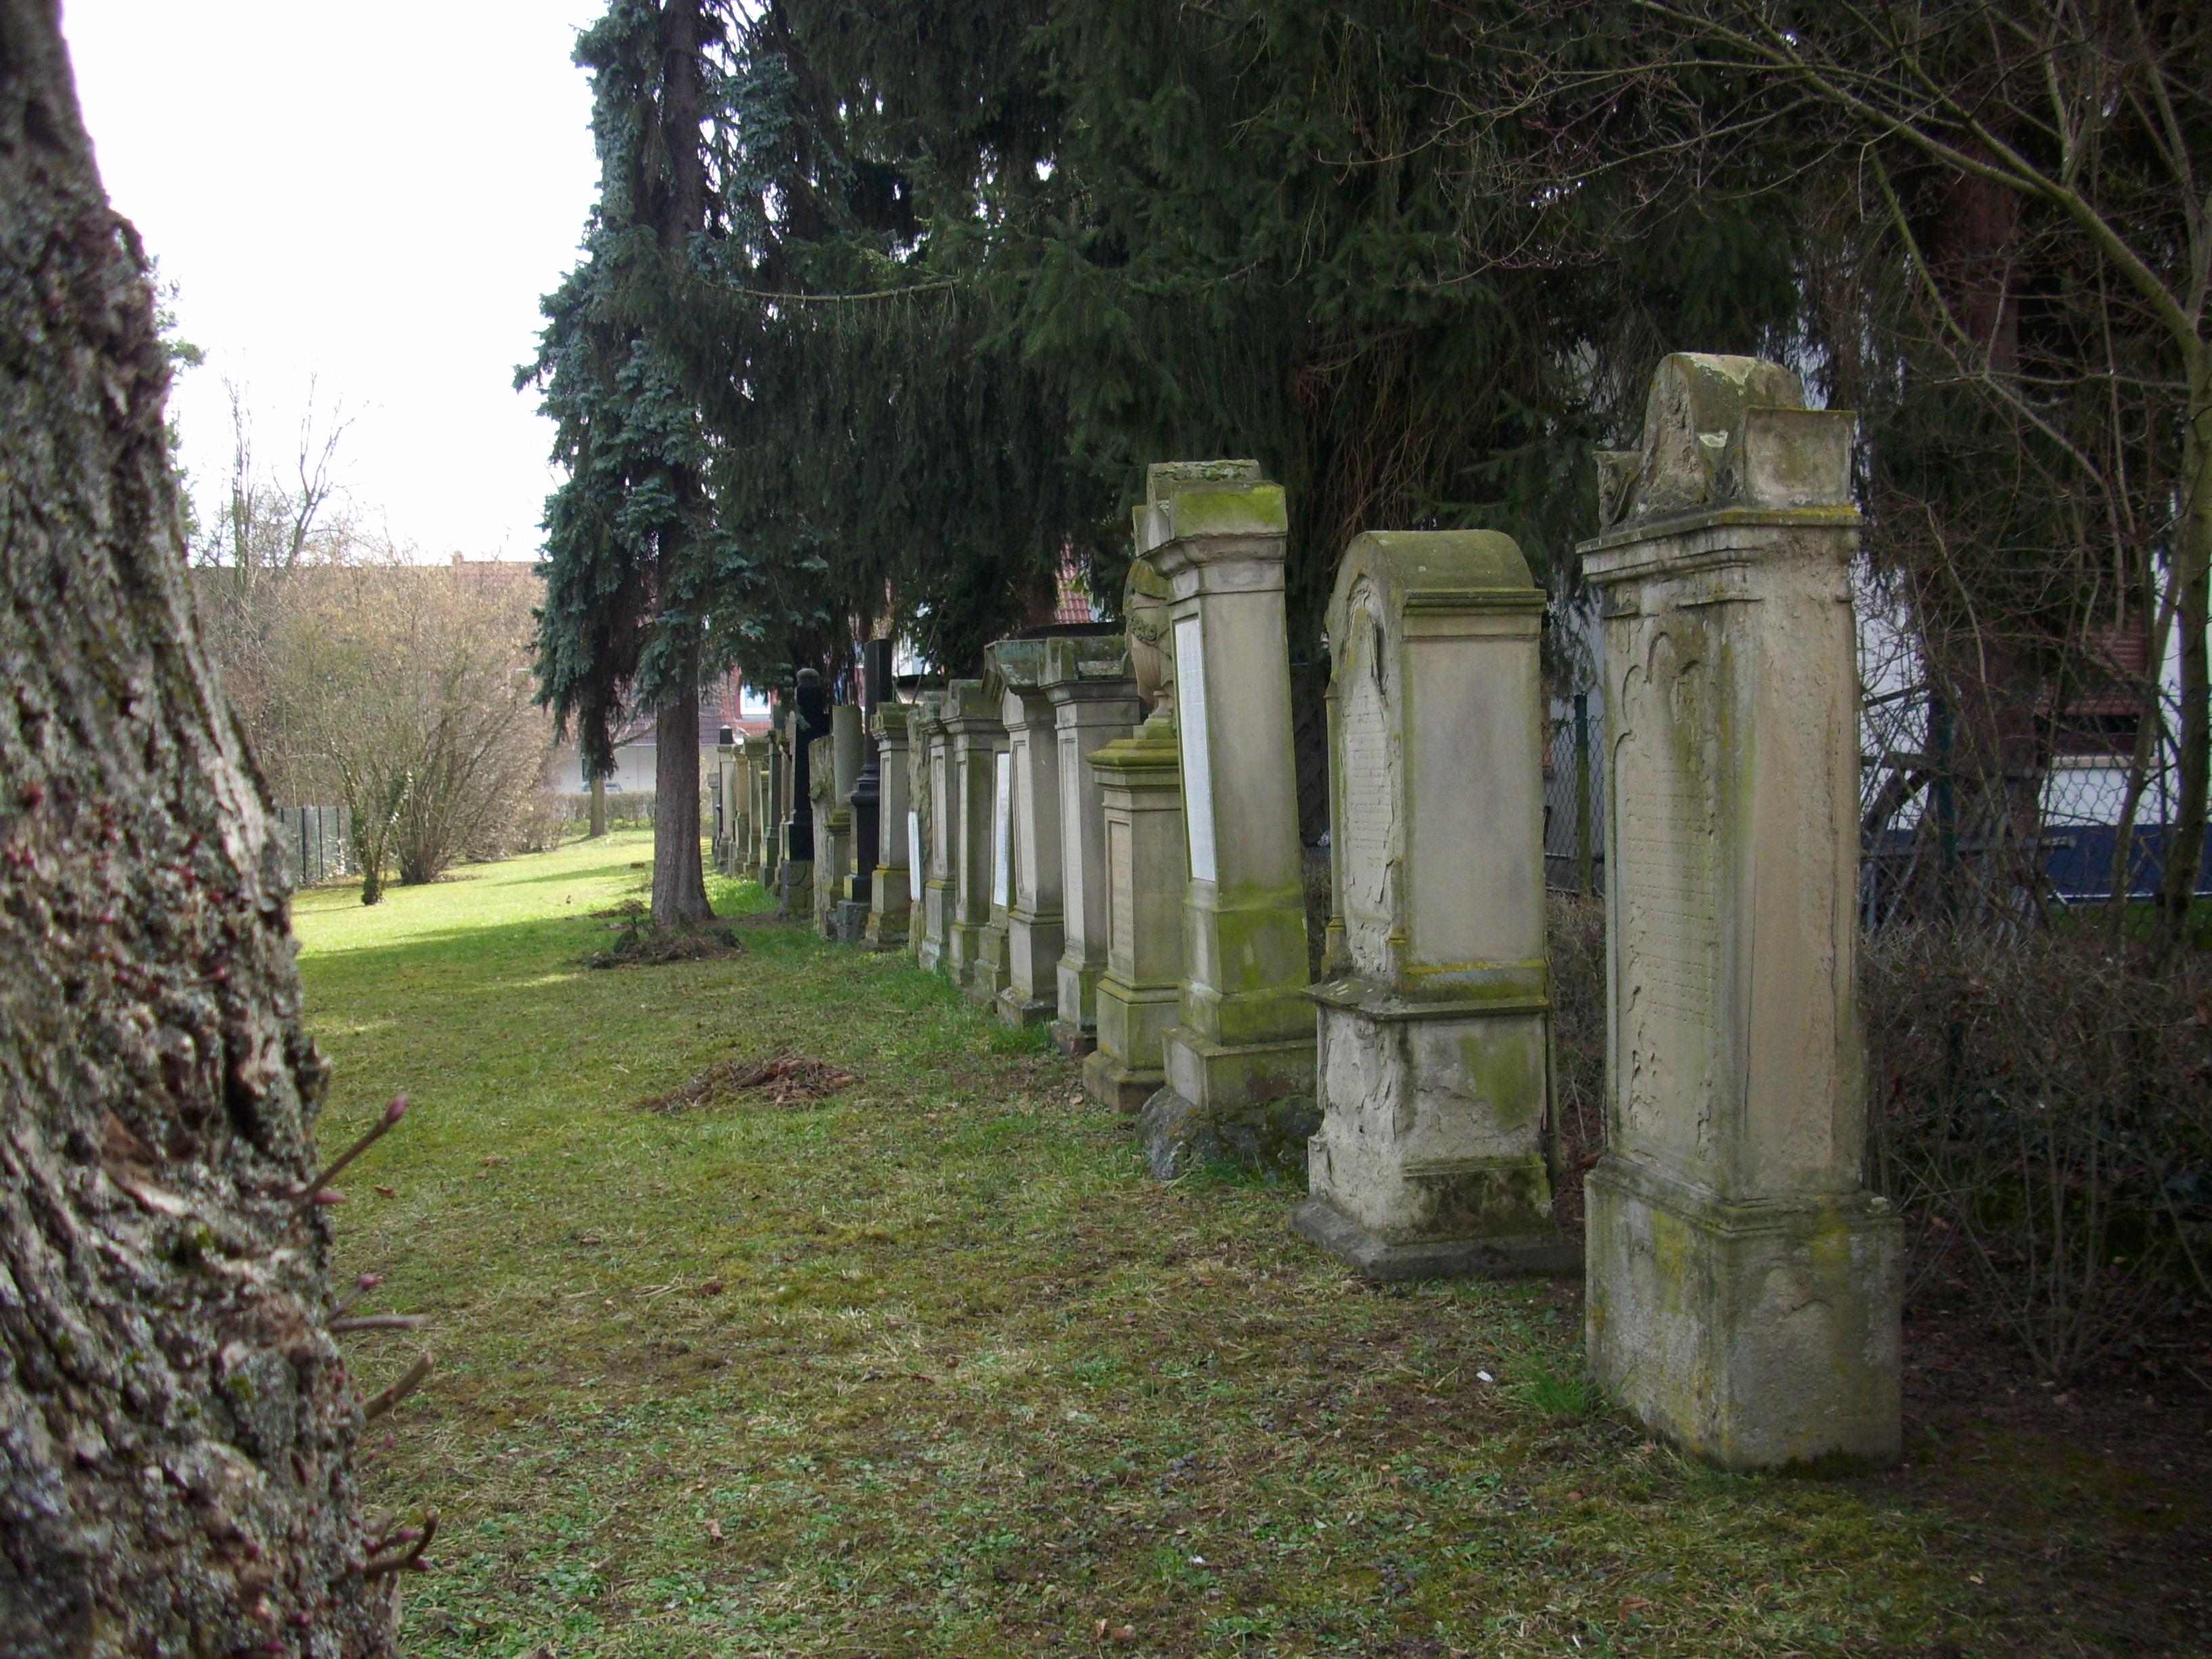 https://upload.wikimedia.org/wikipedia/commons/f/ff/J%C3%BCdischer_Friedhof_Hechtsheim_3.JPG